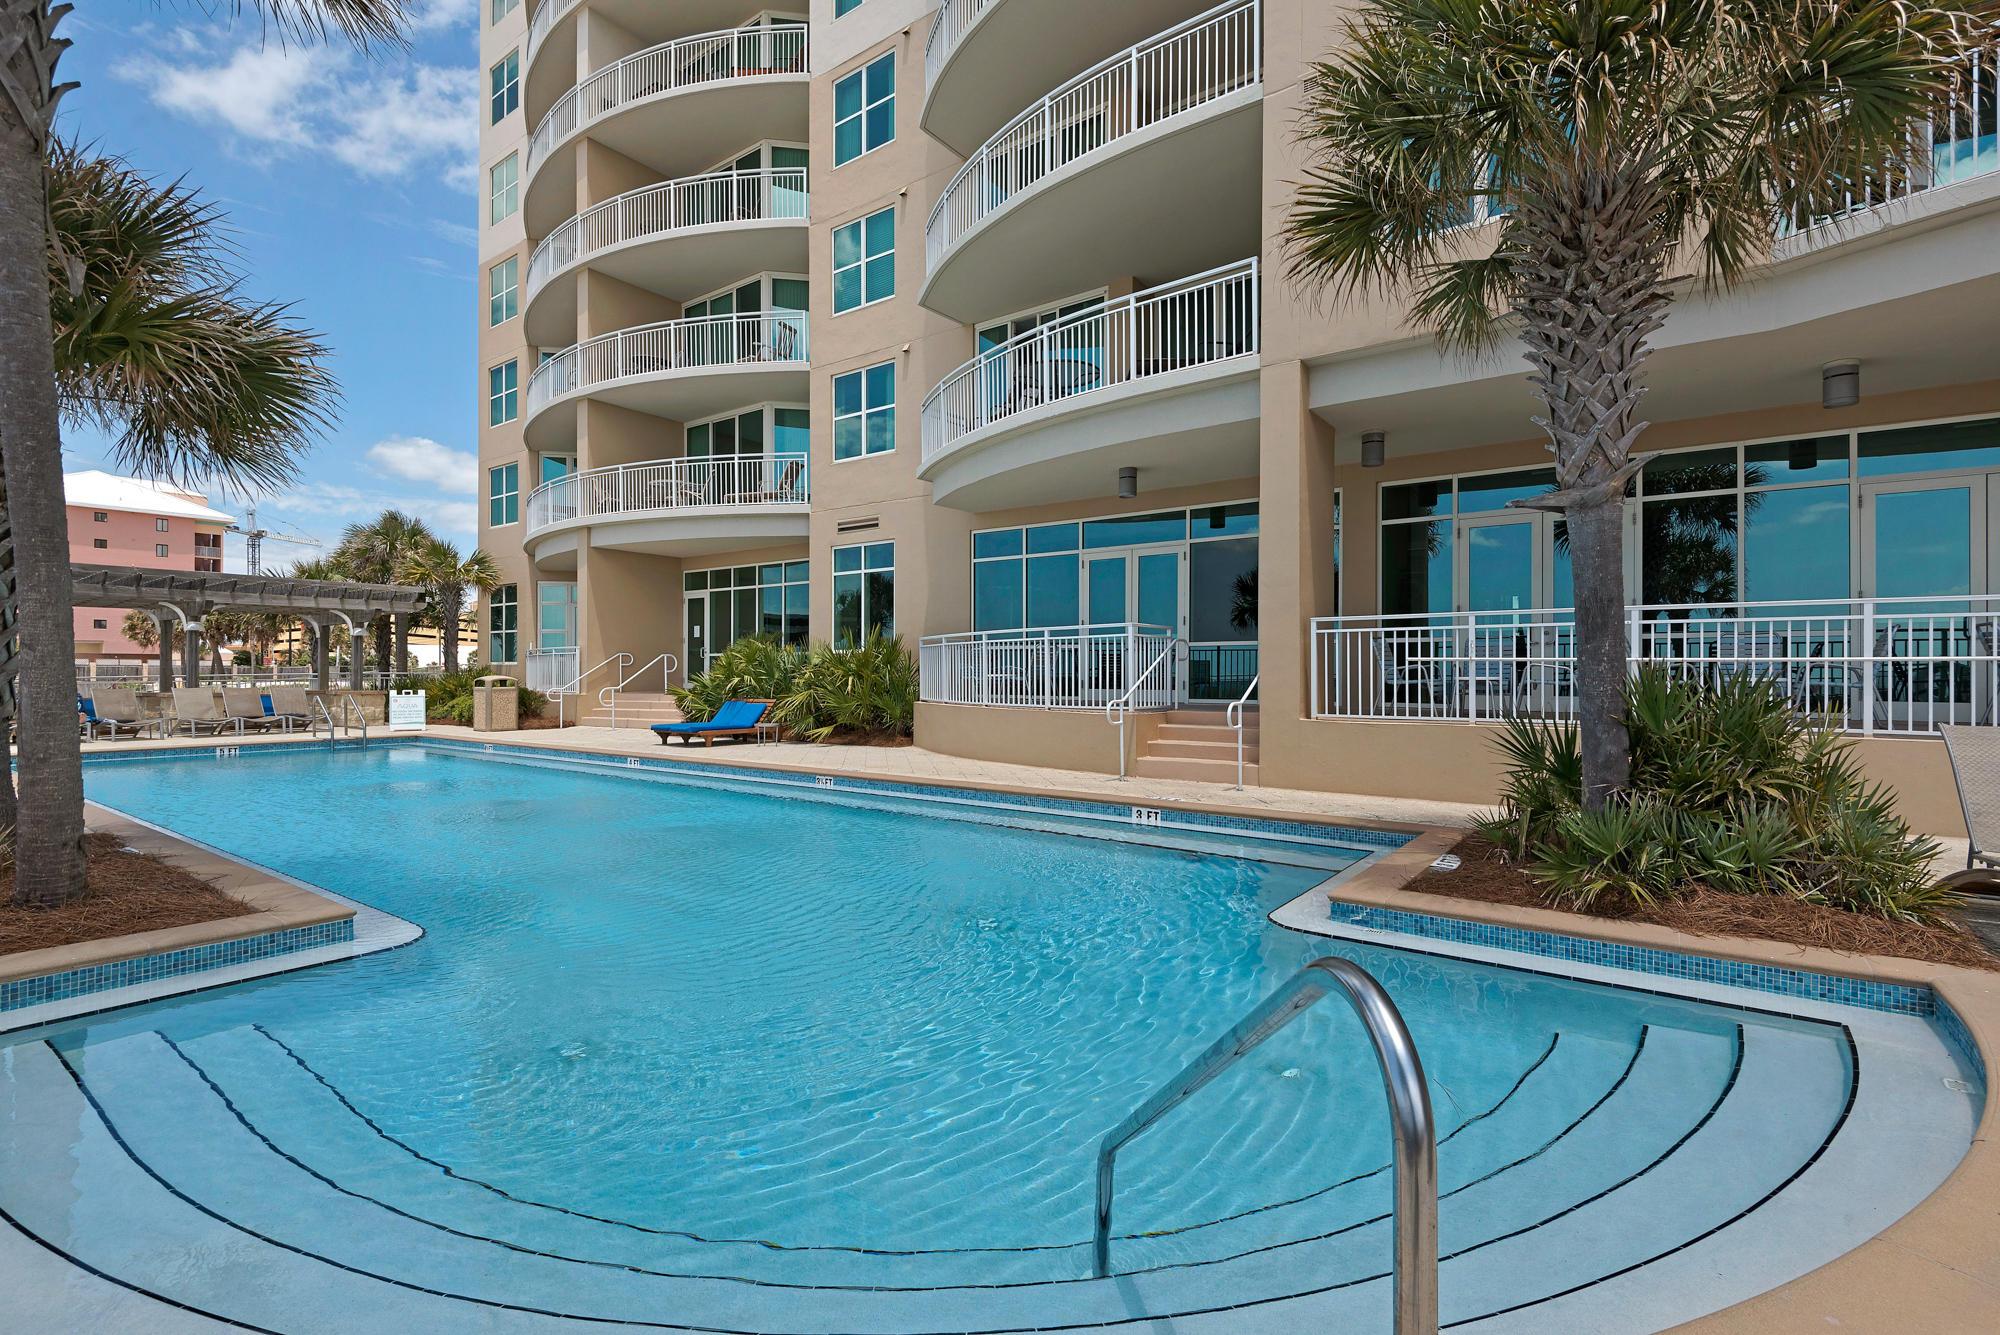 15625 FRONT BEACH ROAD #UNIT 901, PANAMA CITY BEACH, FL 32413